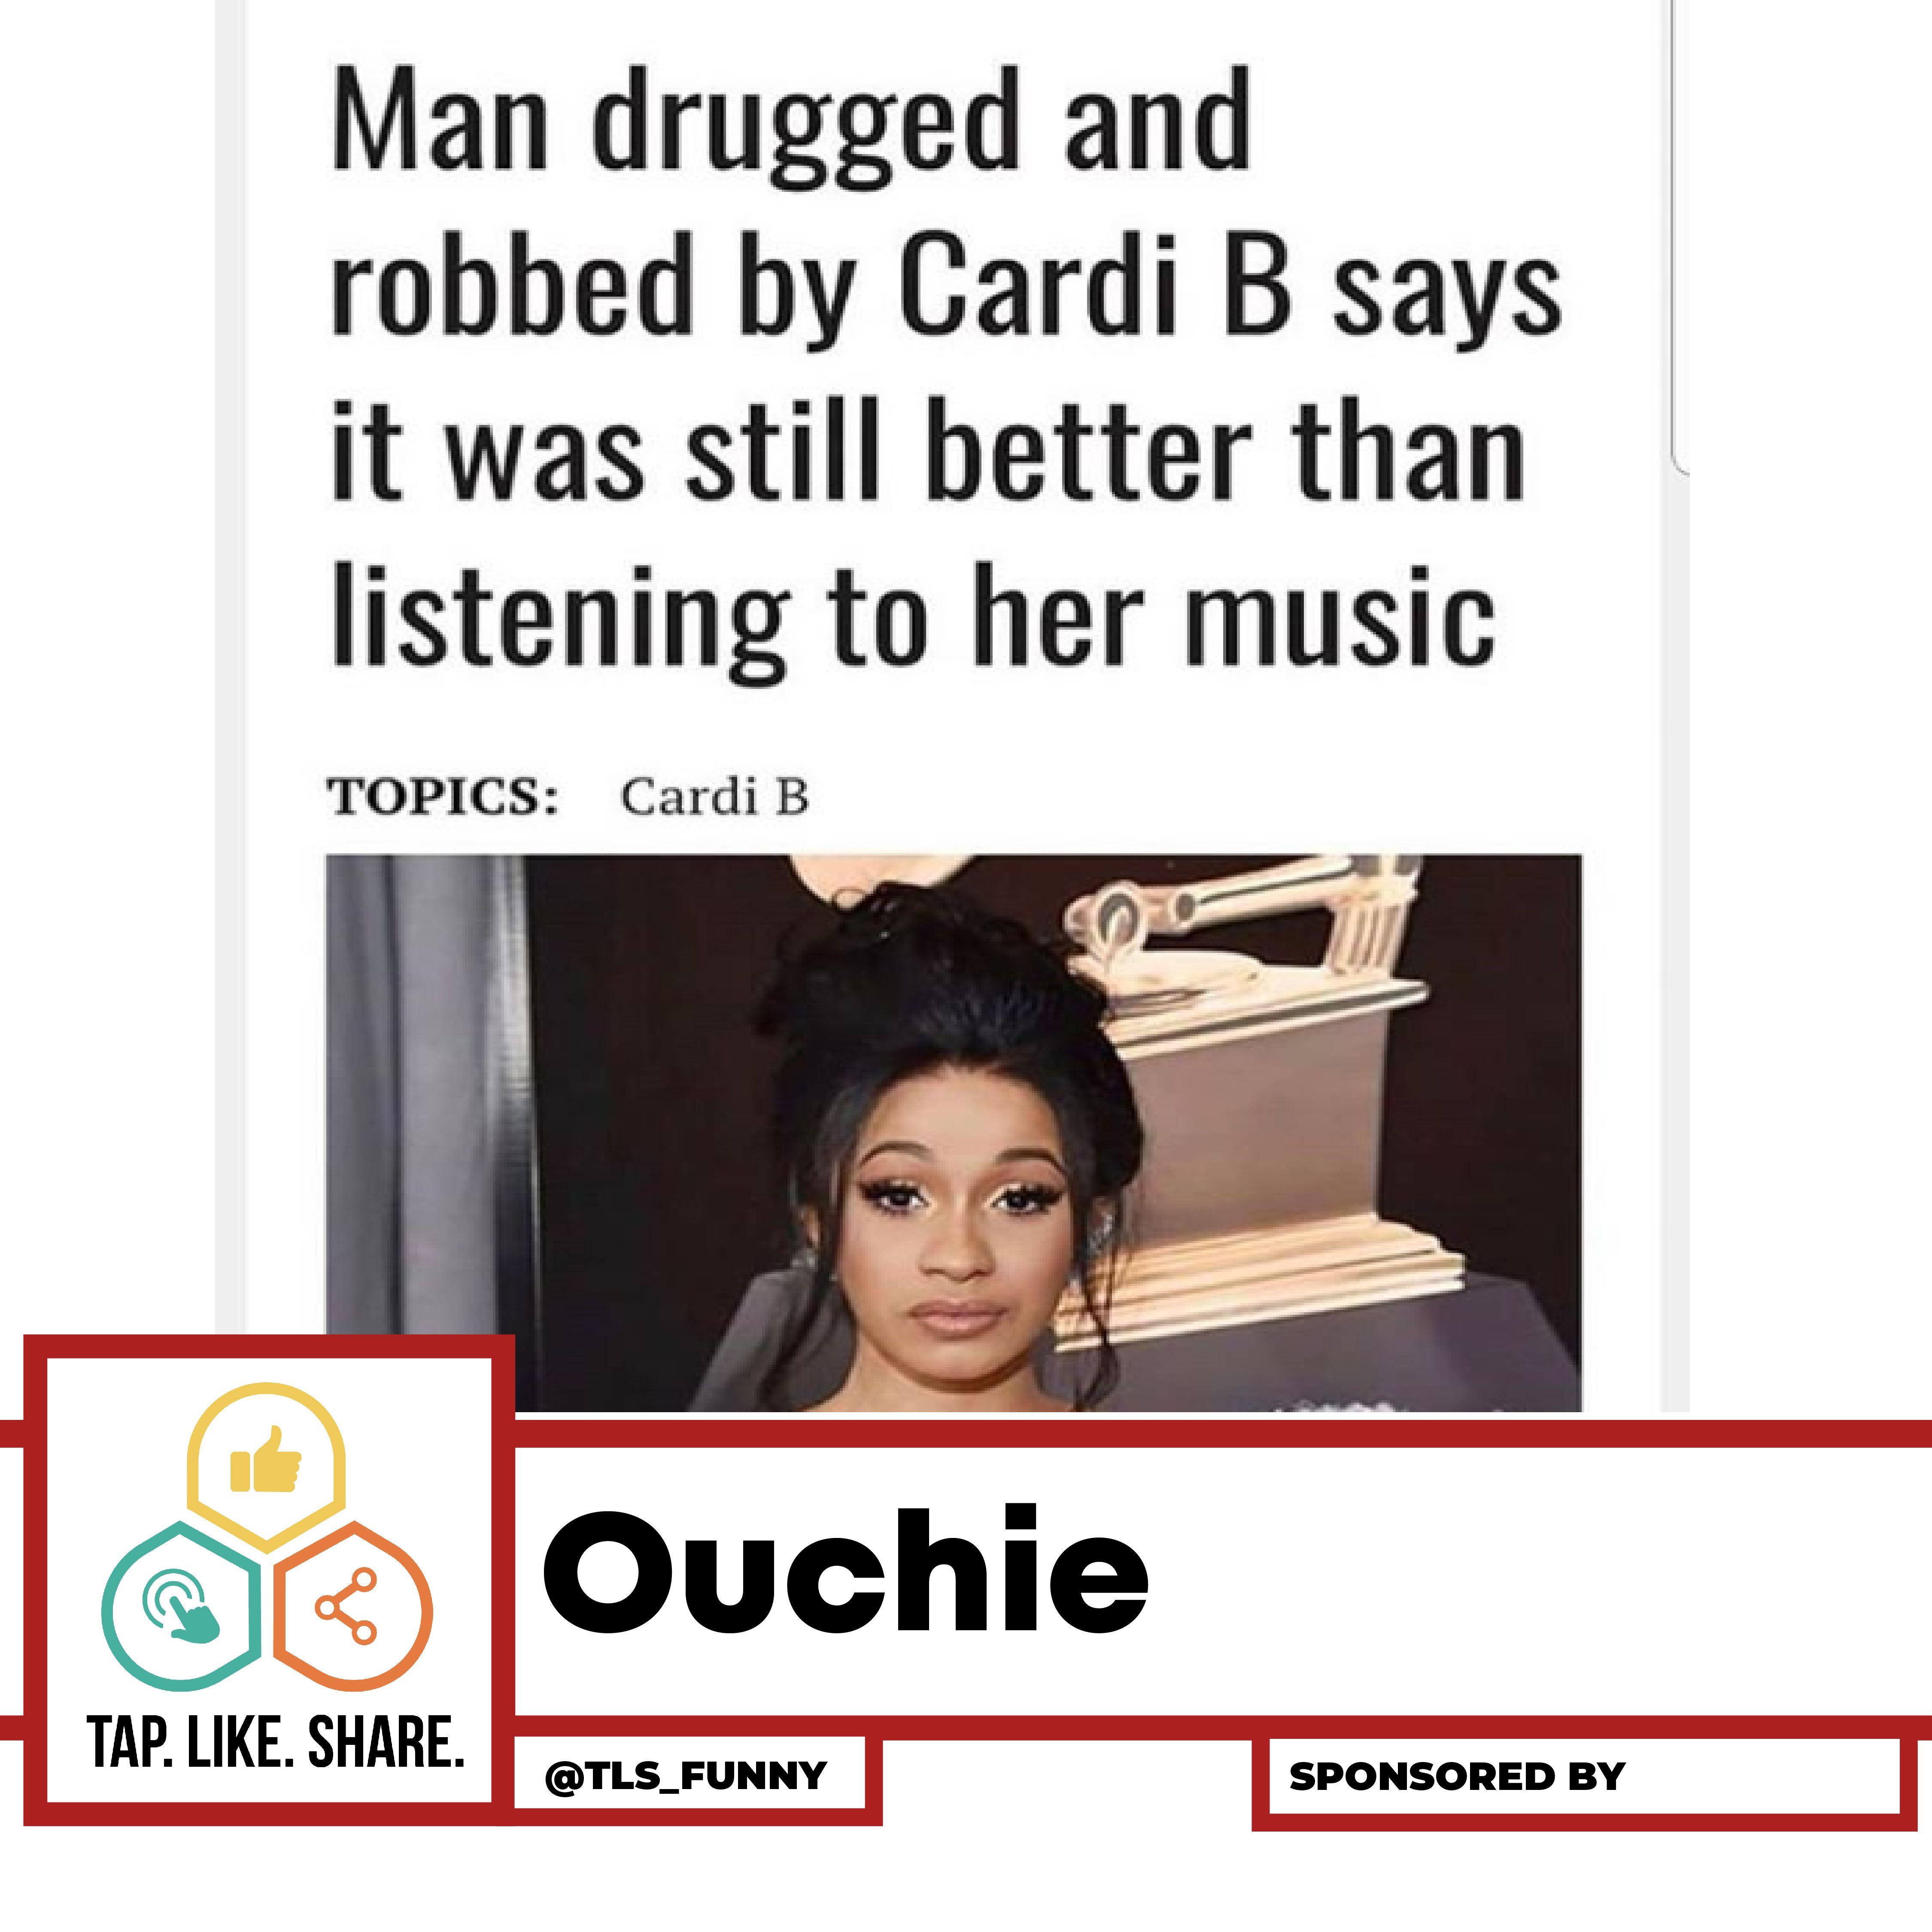 Tap Like Share This Post Is Sponsored By Sponsor Taplikeshare Com Funny Meme Music Badmusic Drugged Funny Instagram Instagram Photo